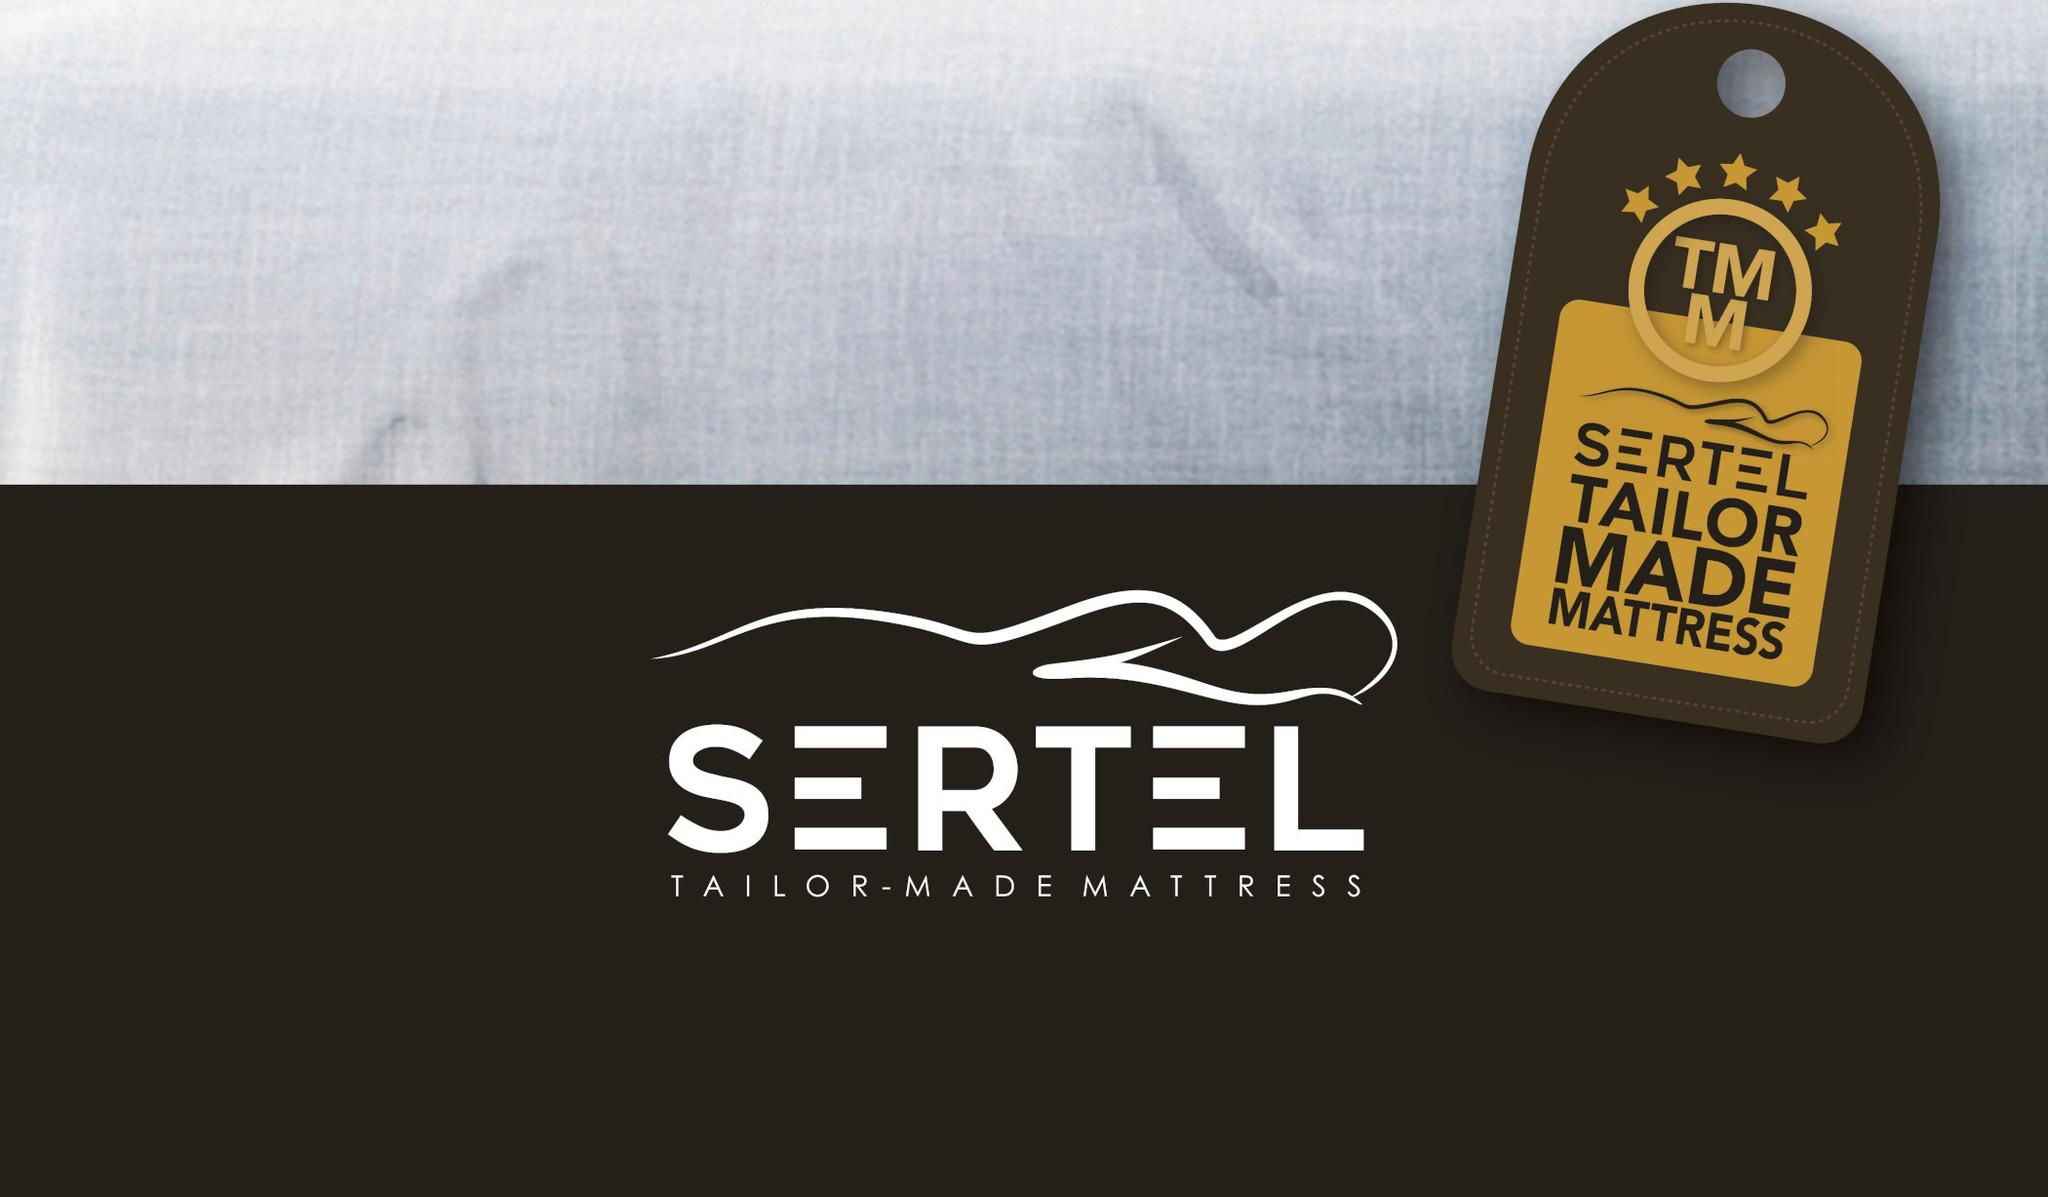 Sertel Tailor Made Mattress